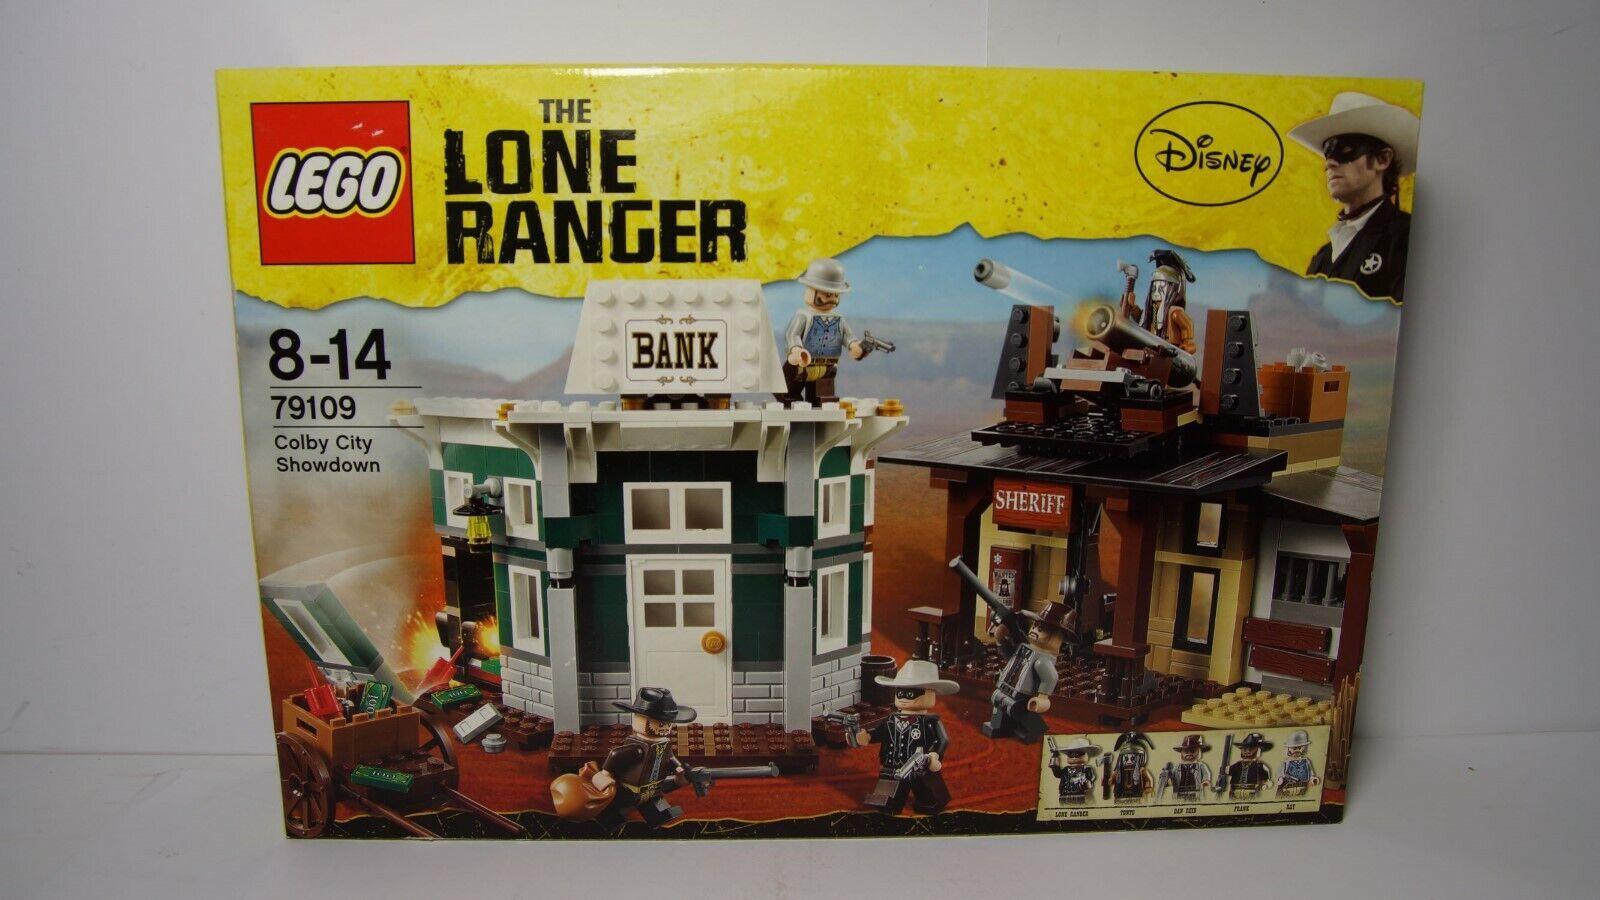 Lego Lego Lego 79110 79109 79108 79107 79106 The Lone Ranger - NEU - OVP 5a2618